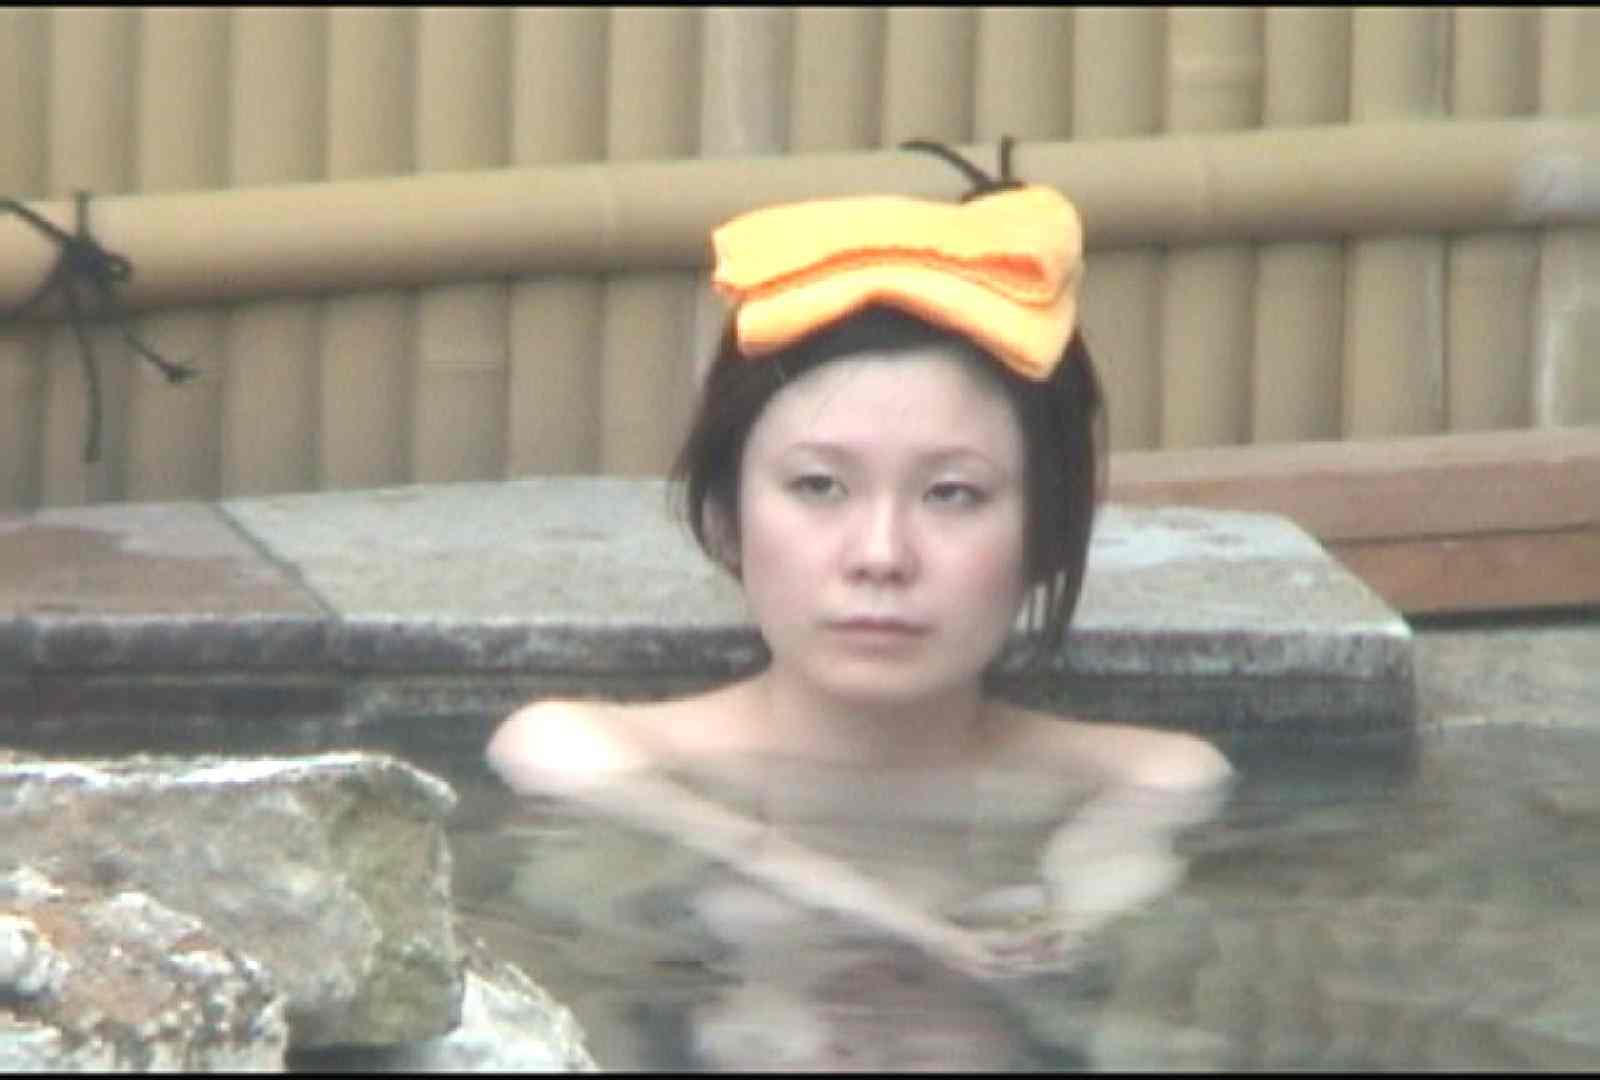 Aquaな露天風呂Vol.177 盗撮師作品  102pic 39